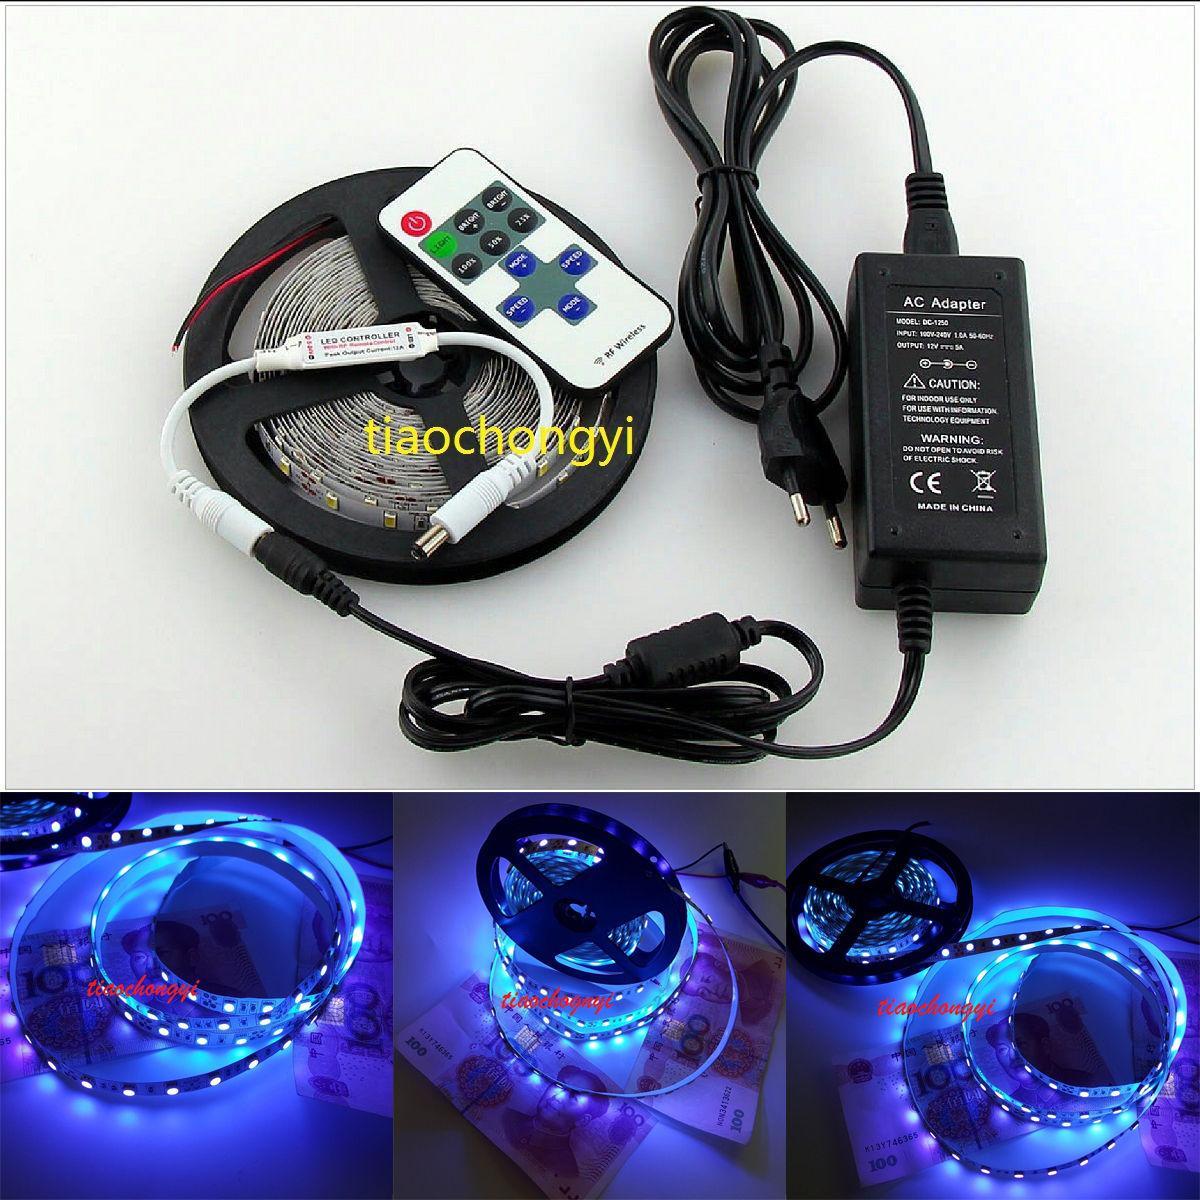 12v 5050 Smd 395 400nm Uv Led Flexible Strip Light Lamp+Rf Remote+5a ...